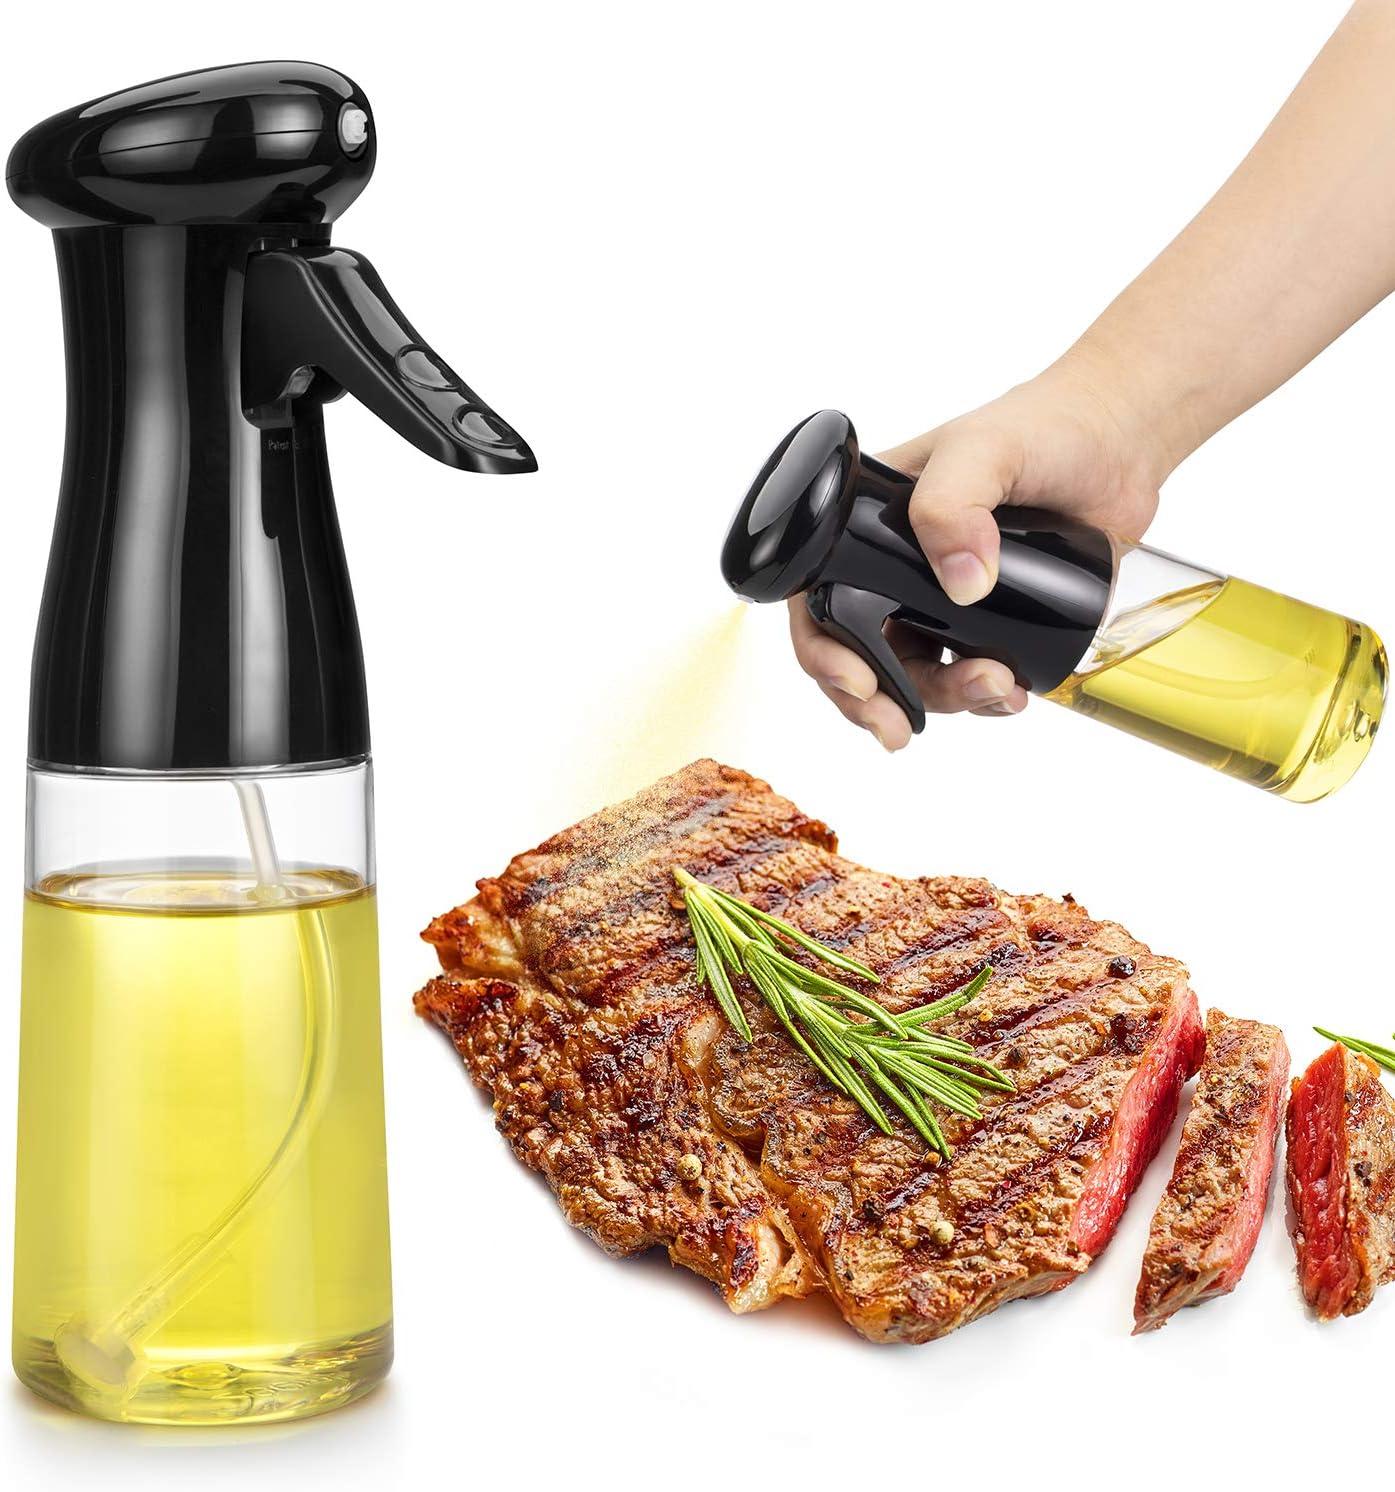 Oil Sprayer for Cooking, Food Grade Olive Oil Spray BPA Free, 210ml Oil Spray Bottle, Olive Oil Sprayer Mister for Cooking, Salad, BBQ, Backing, Roasting, Frying, Kitchen (Black)